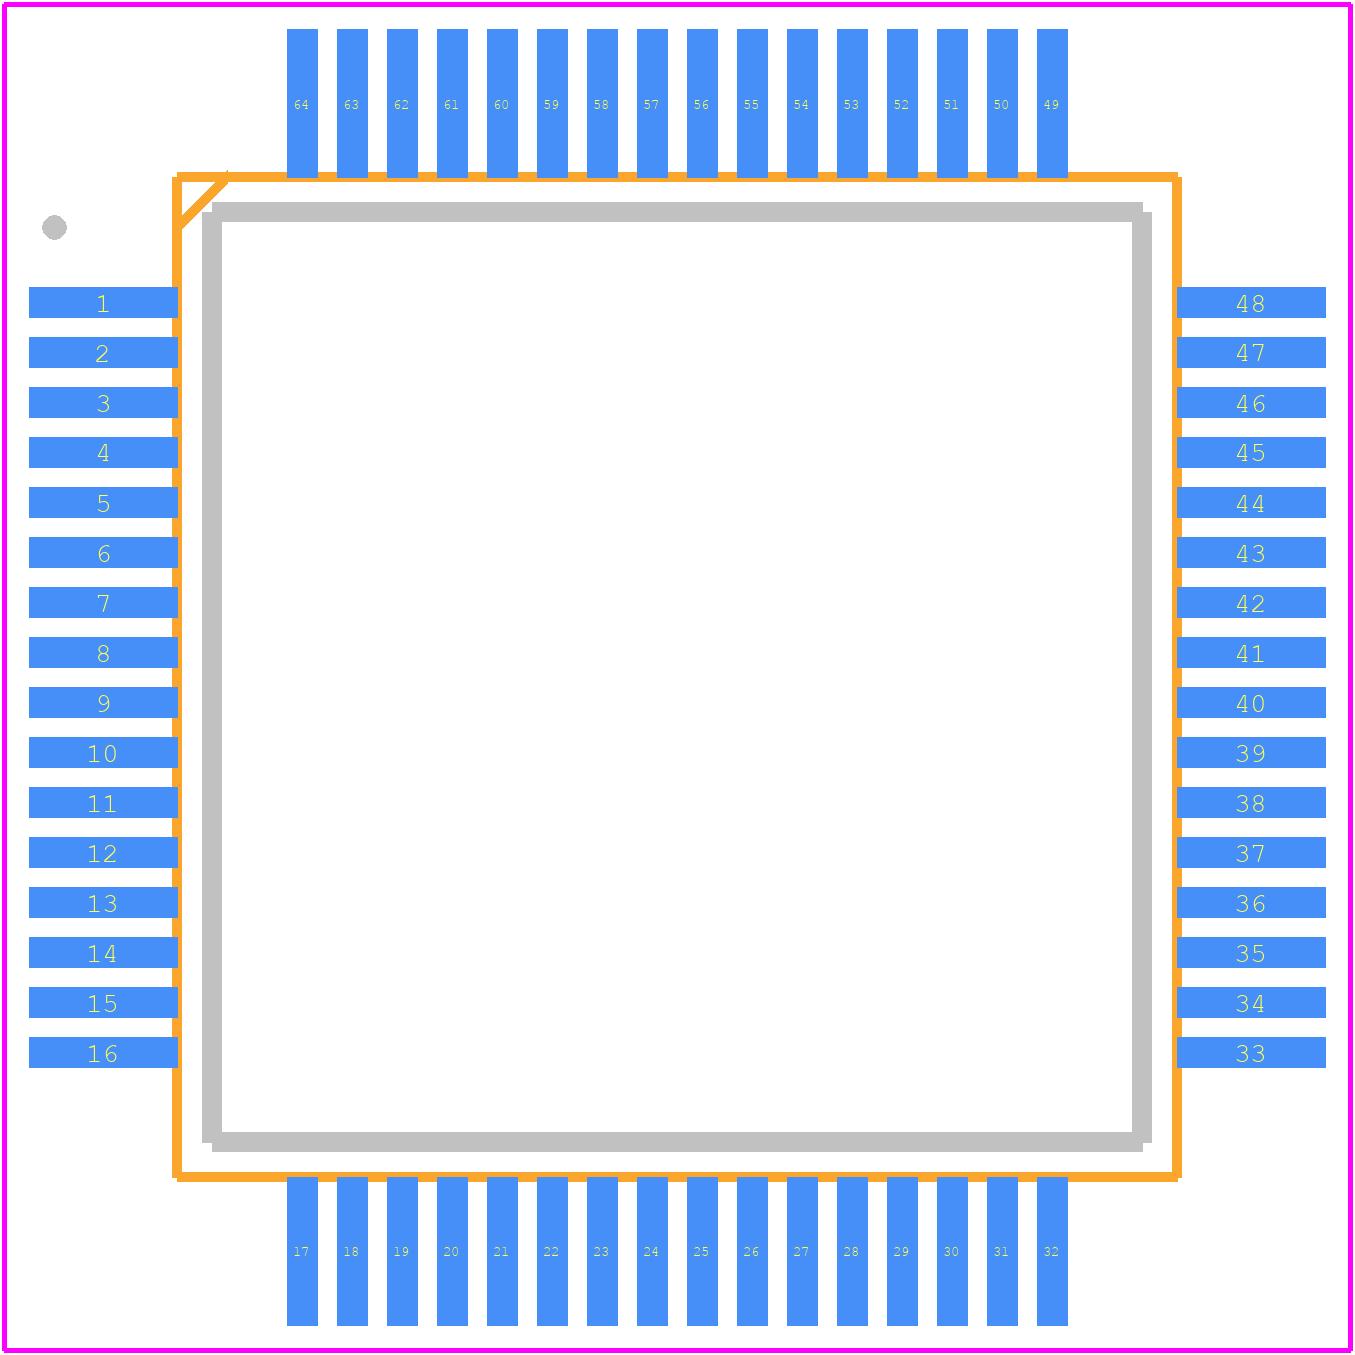 PIC18F67K22-I/PTRSL - Microchip PCB footprint - Quad Flat Packages - (PT)64-Lead(TQFP)